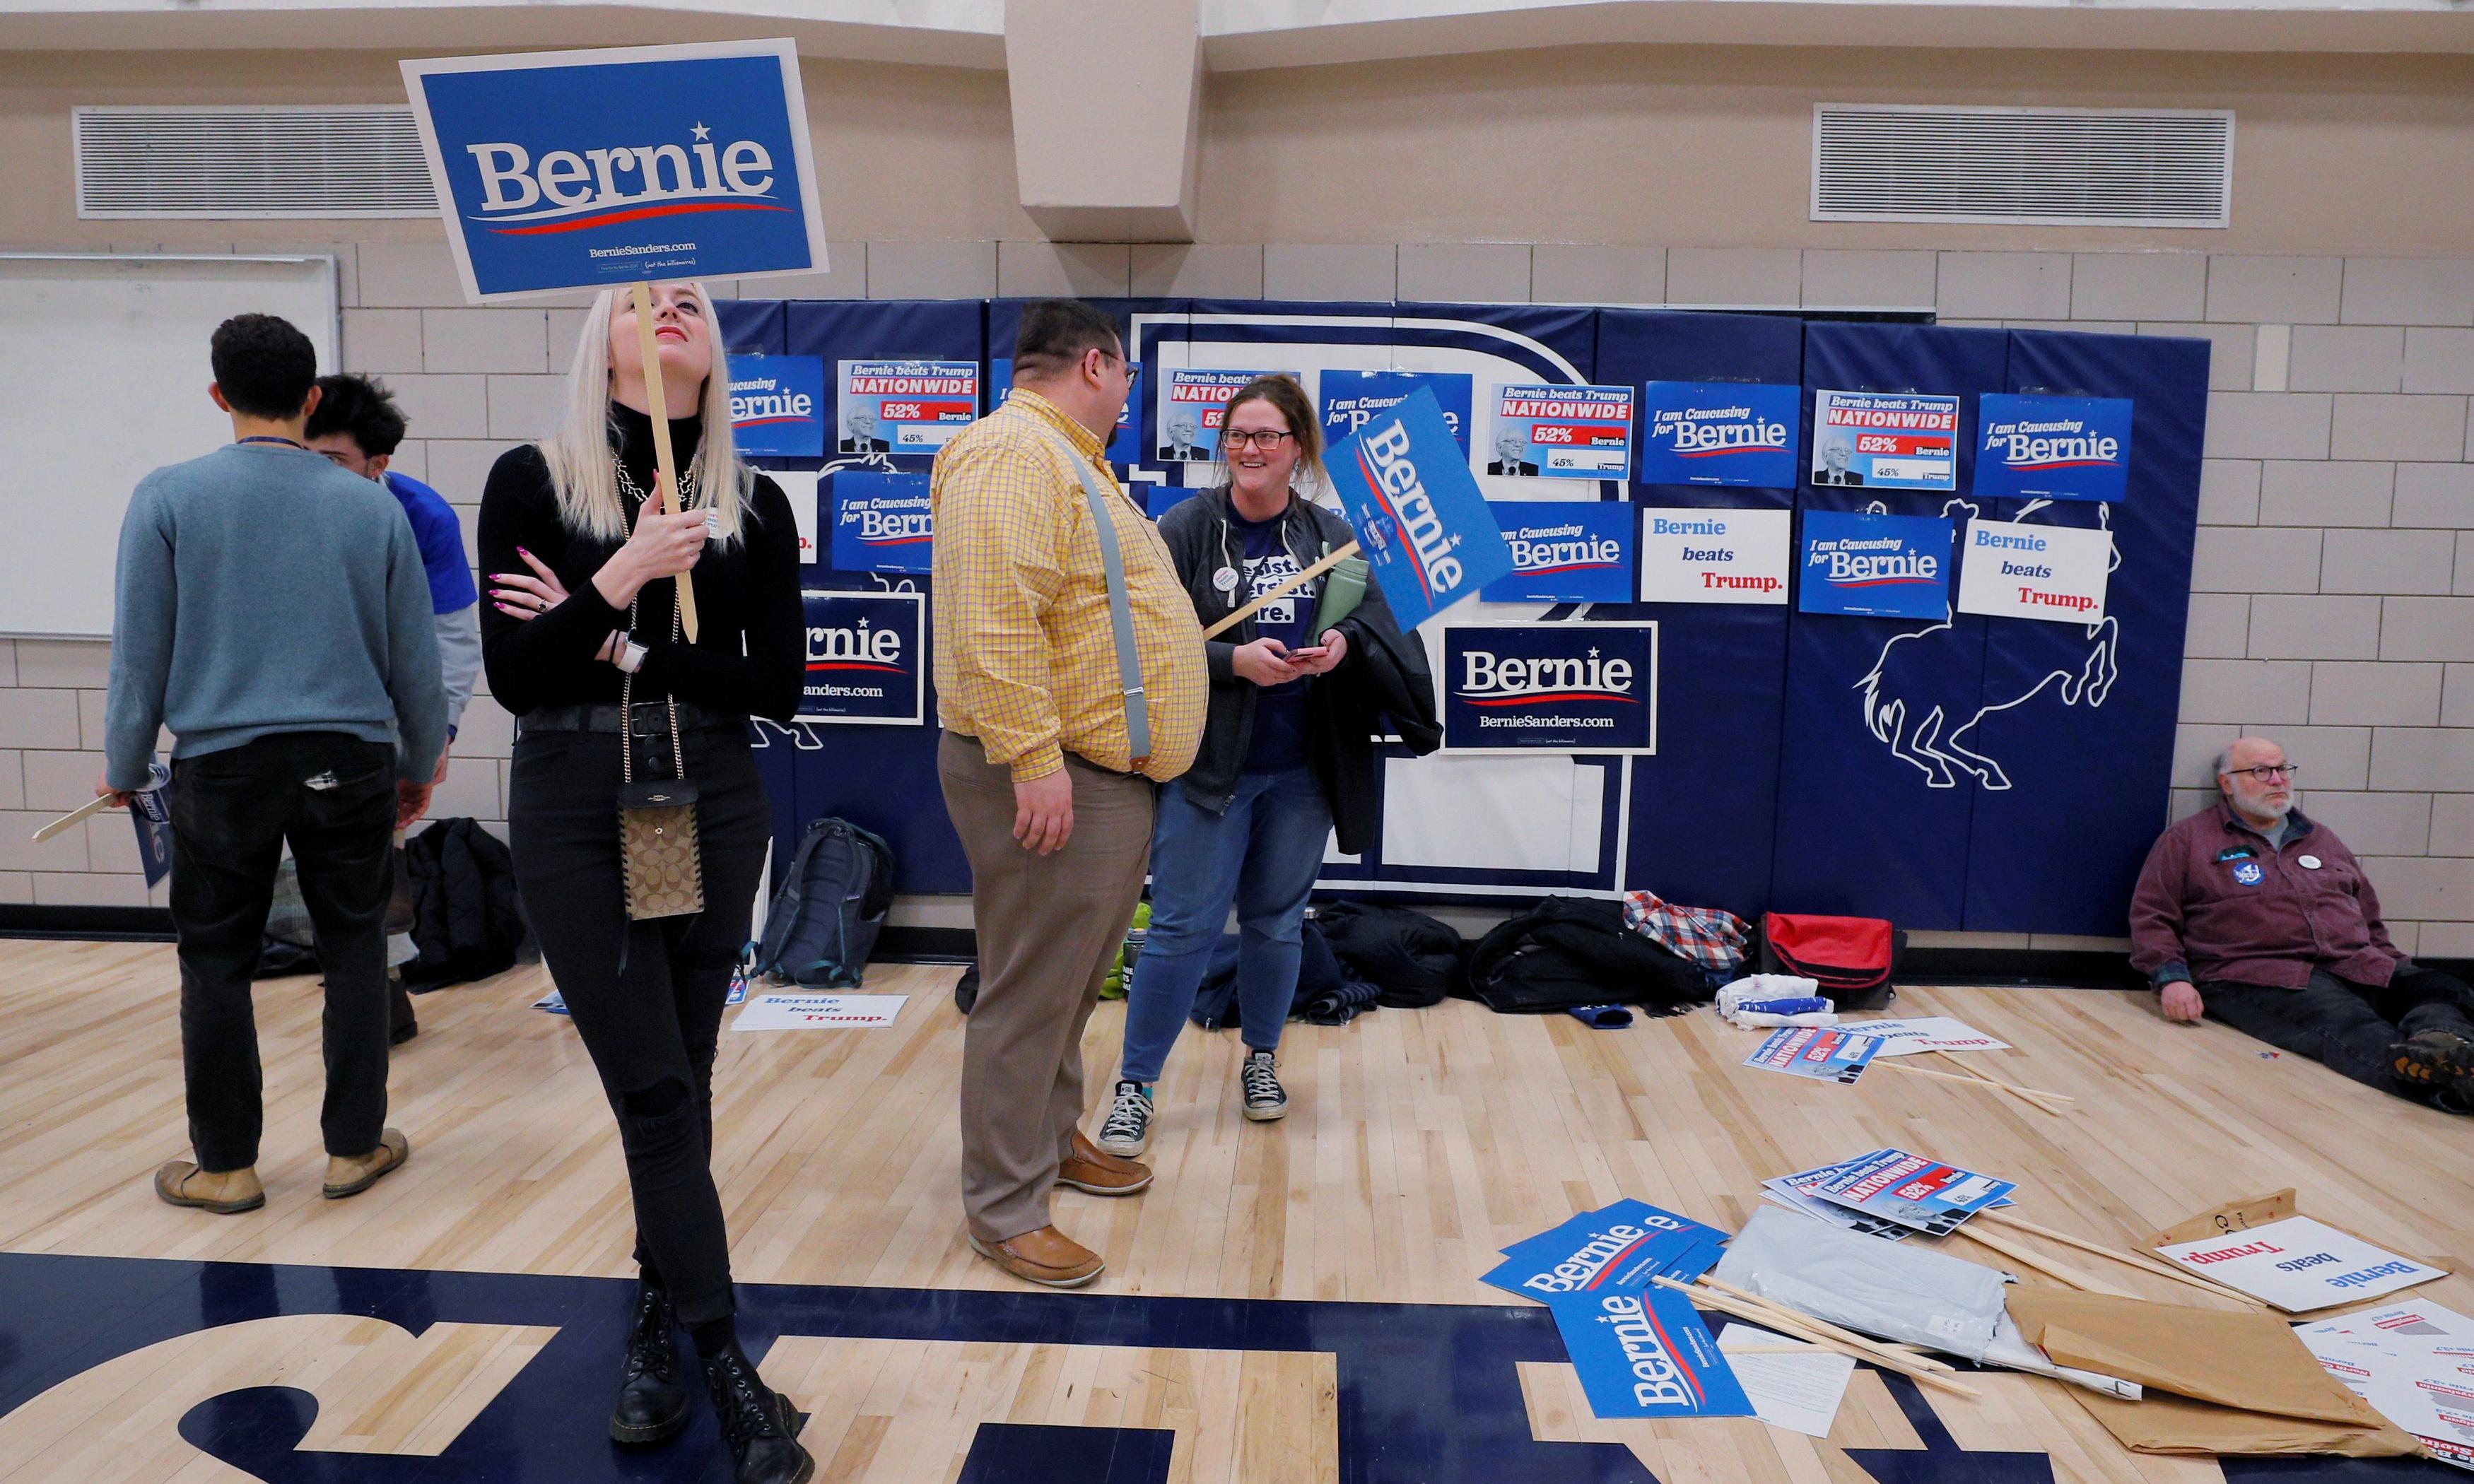 Trump fans flooded hotline to disrupt Iowa caucus process, Democrats say